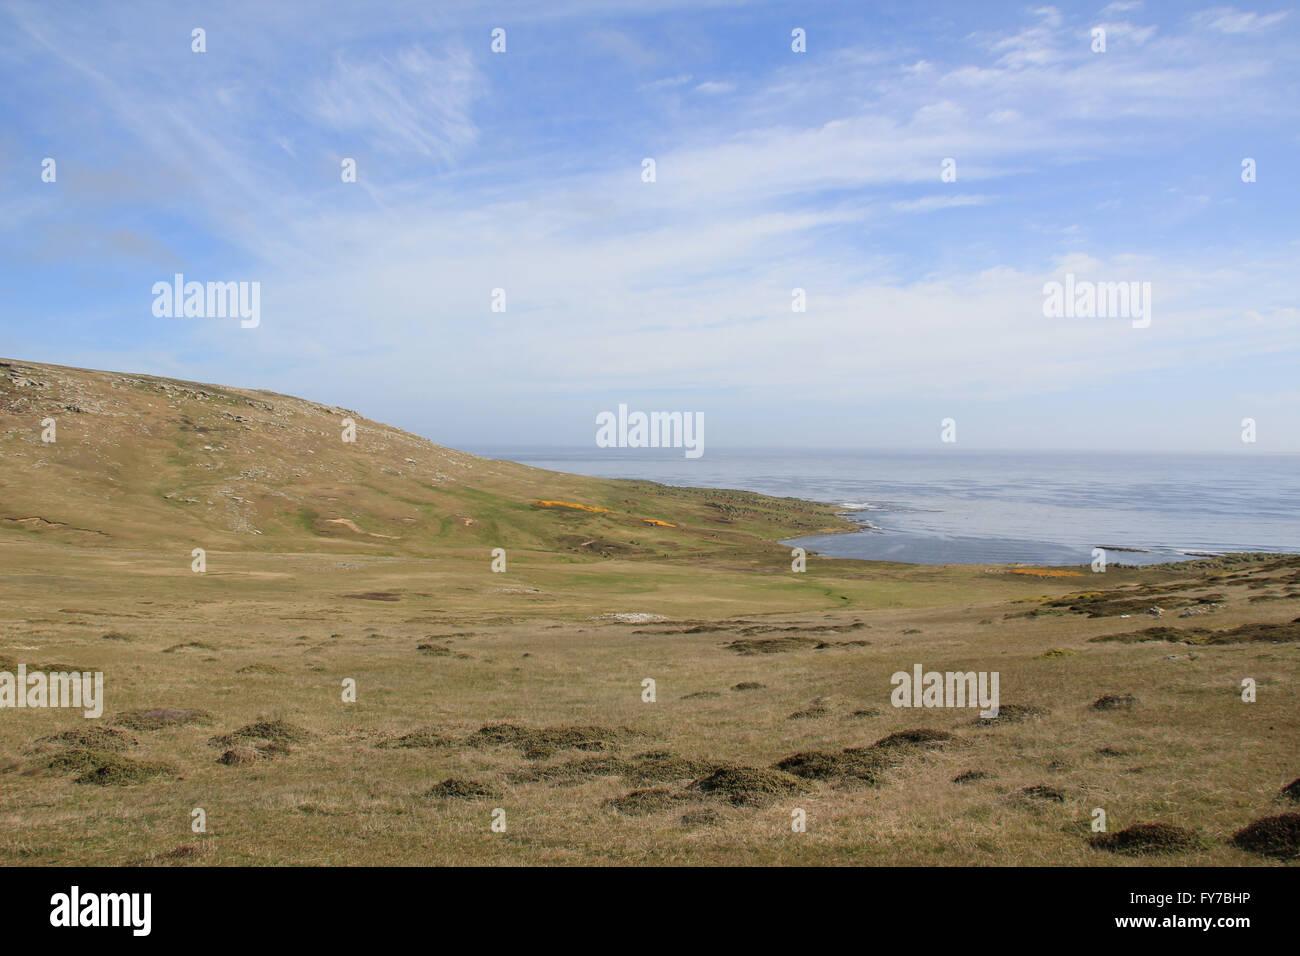 The grasslands of West Point Island, Falkland Islands - Stock Image